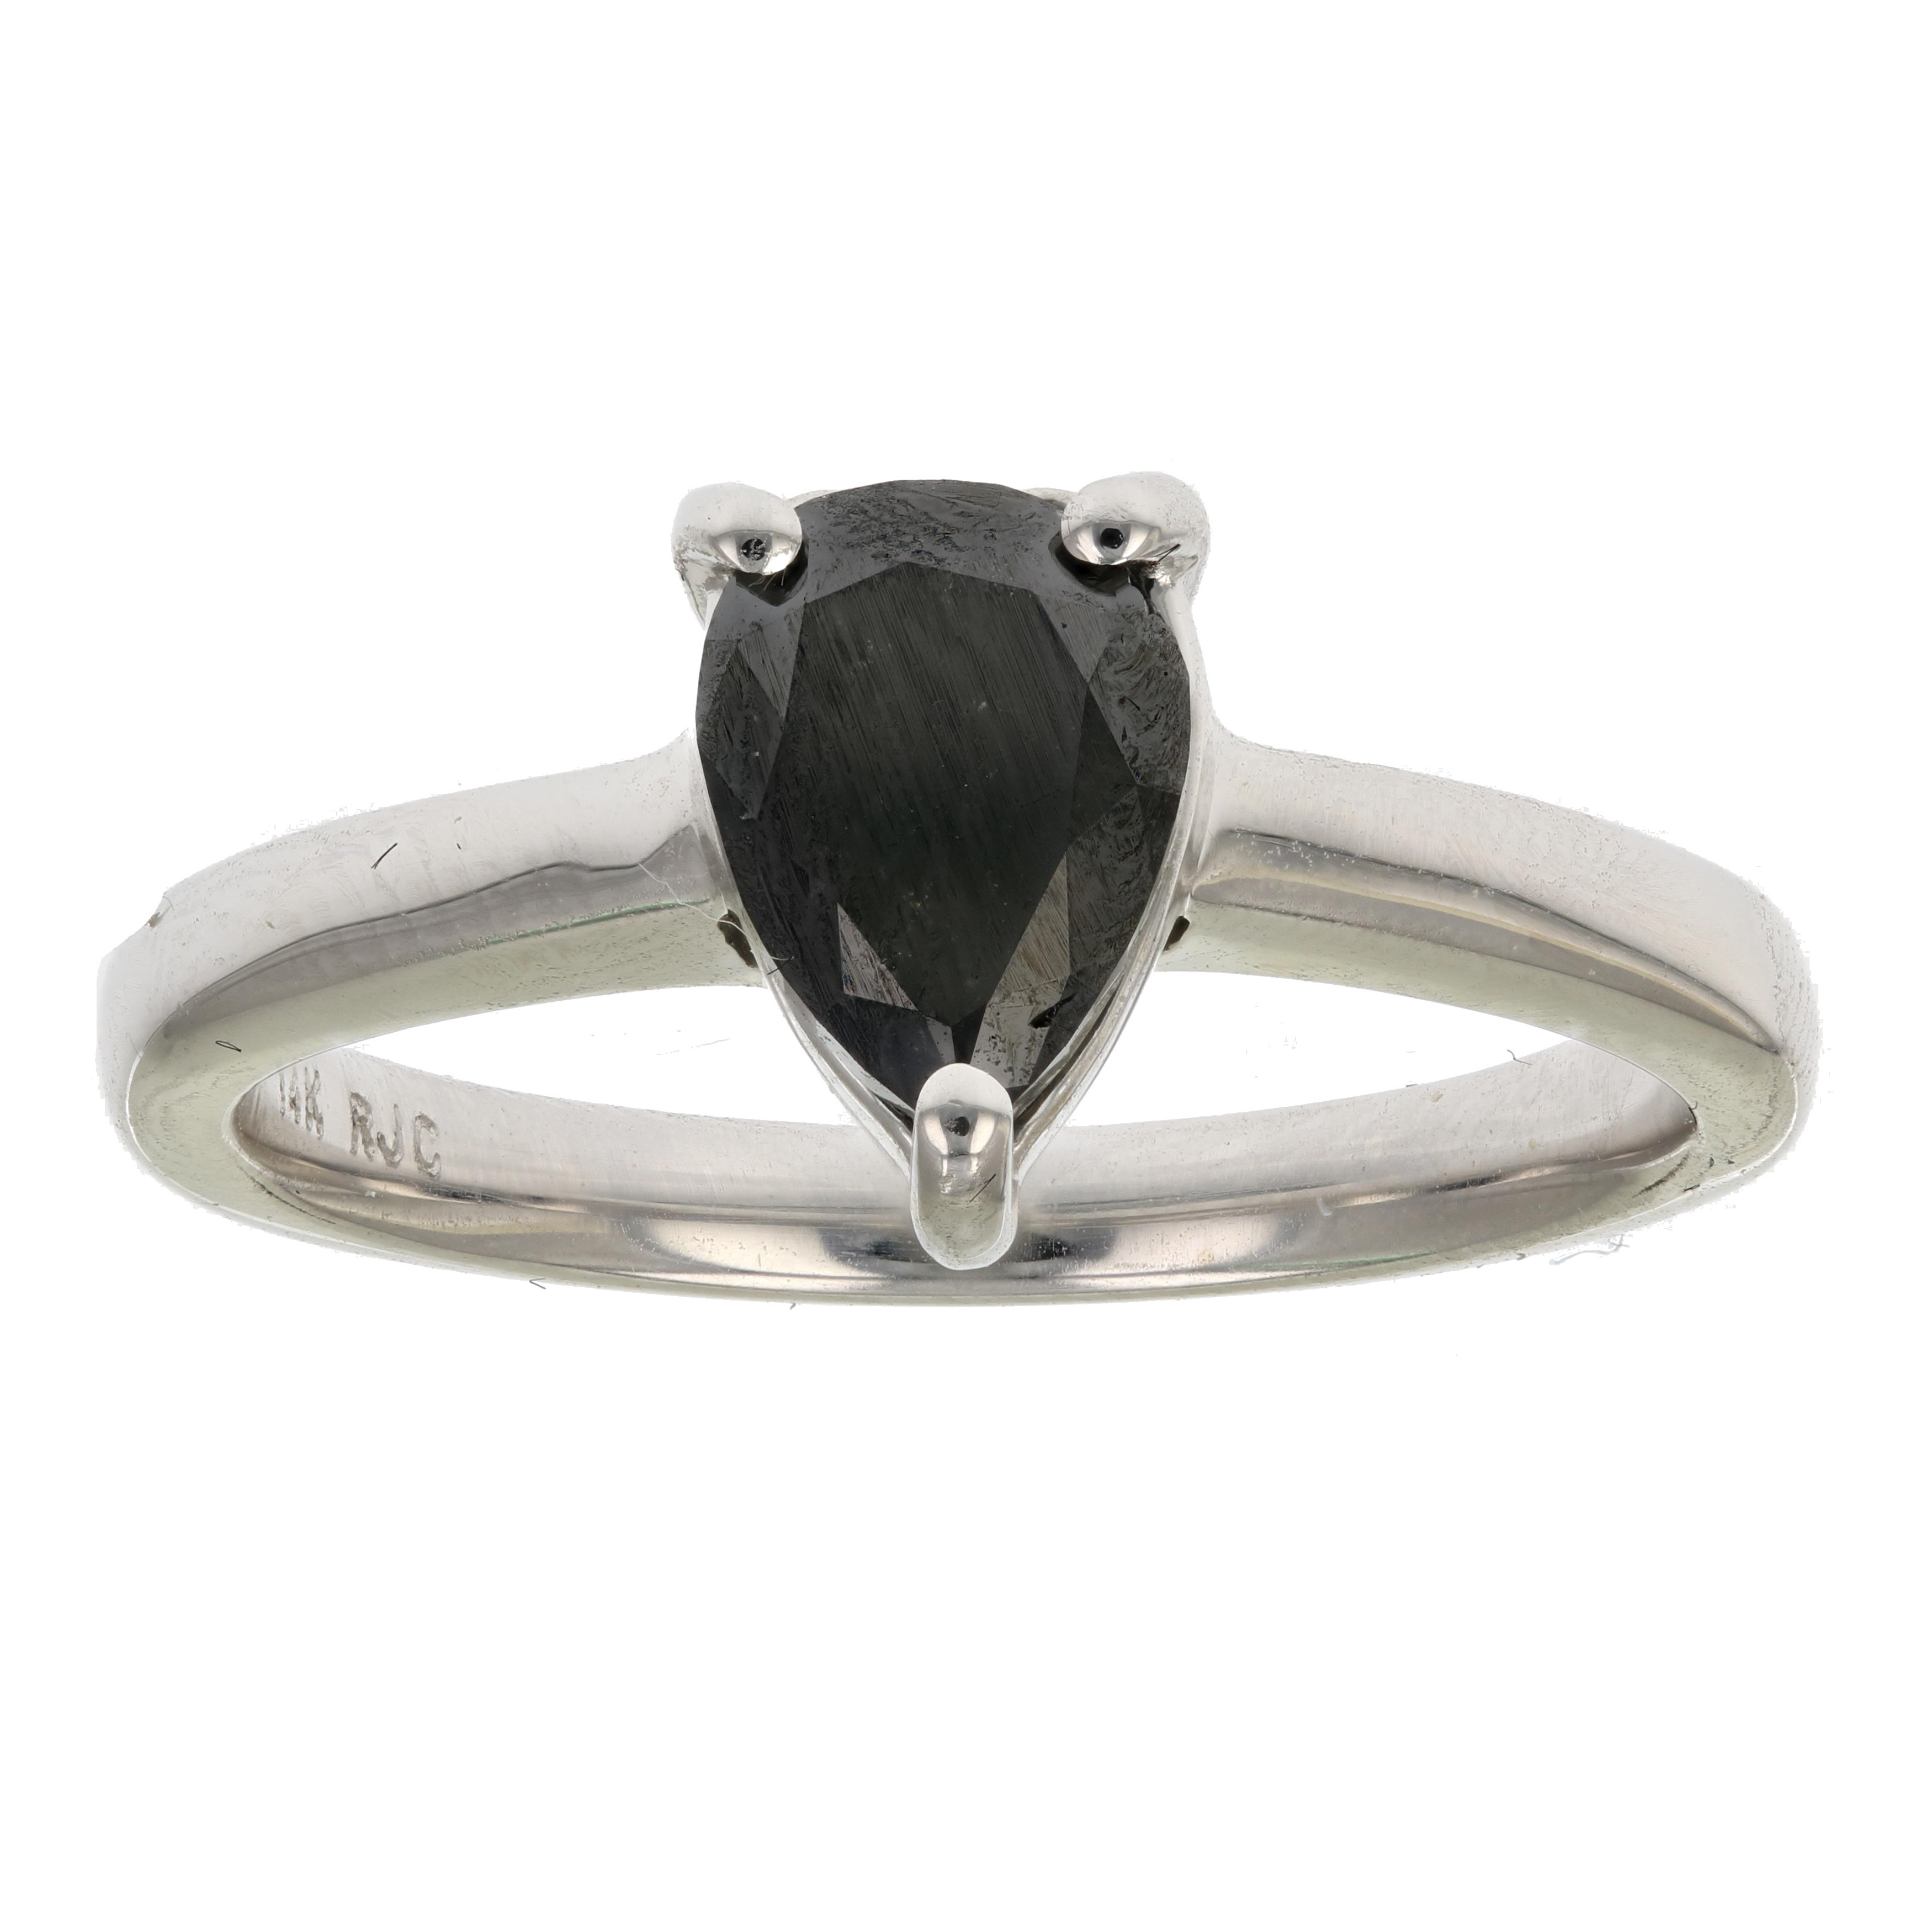 1 4 ct black diamond solitaire ring pear shape 14k white. Black Bedroom Furniture Sets. Home Design Ideas